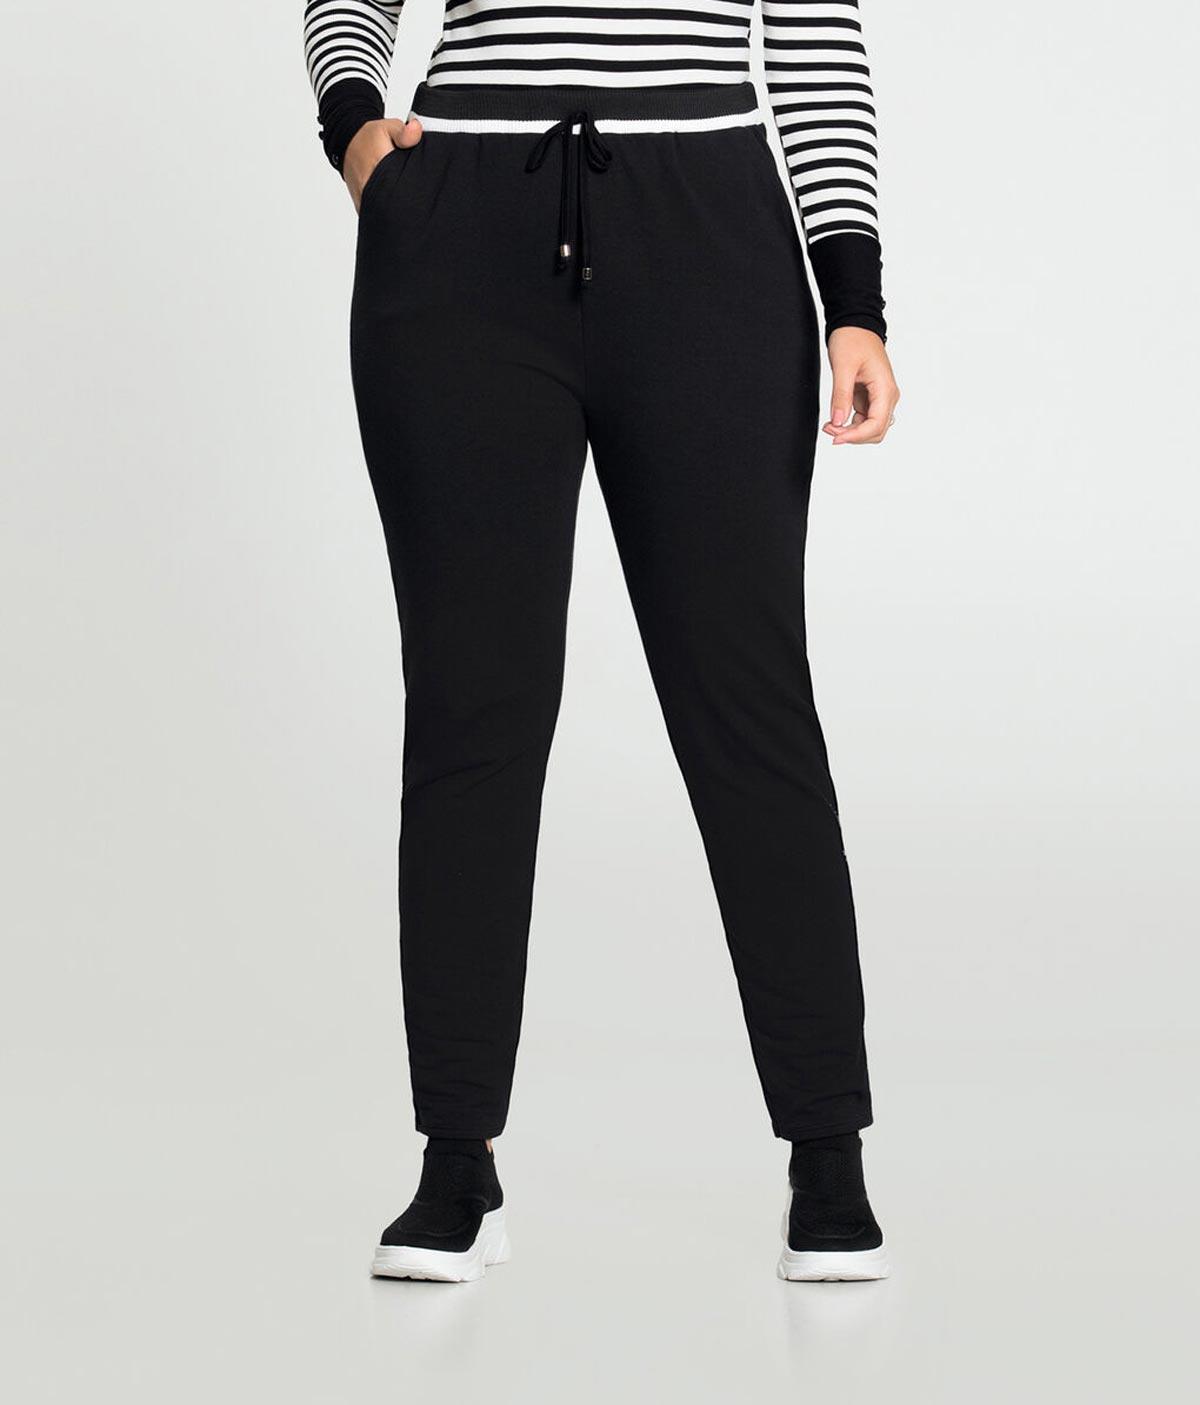 Calça Jogging Feminina Lunender Plus Size